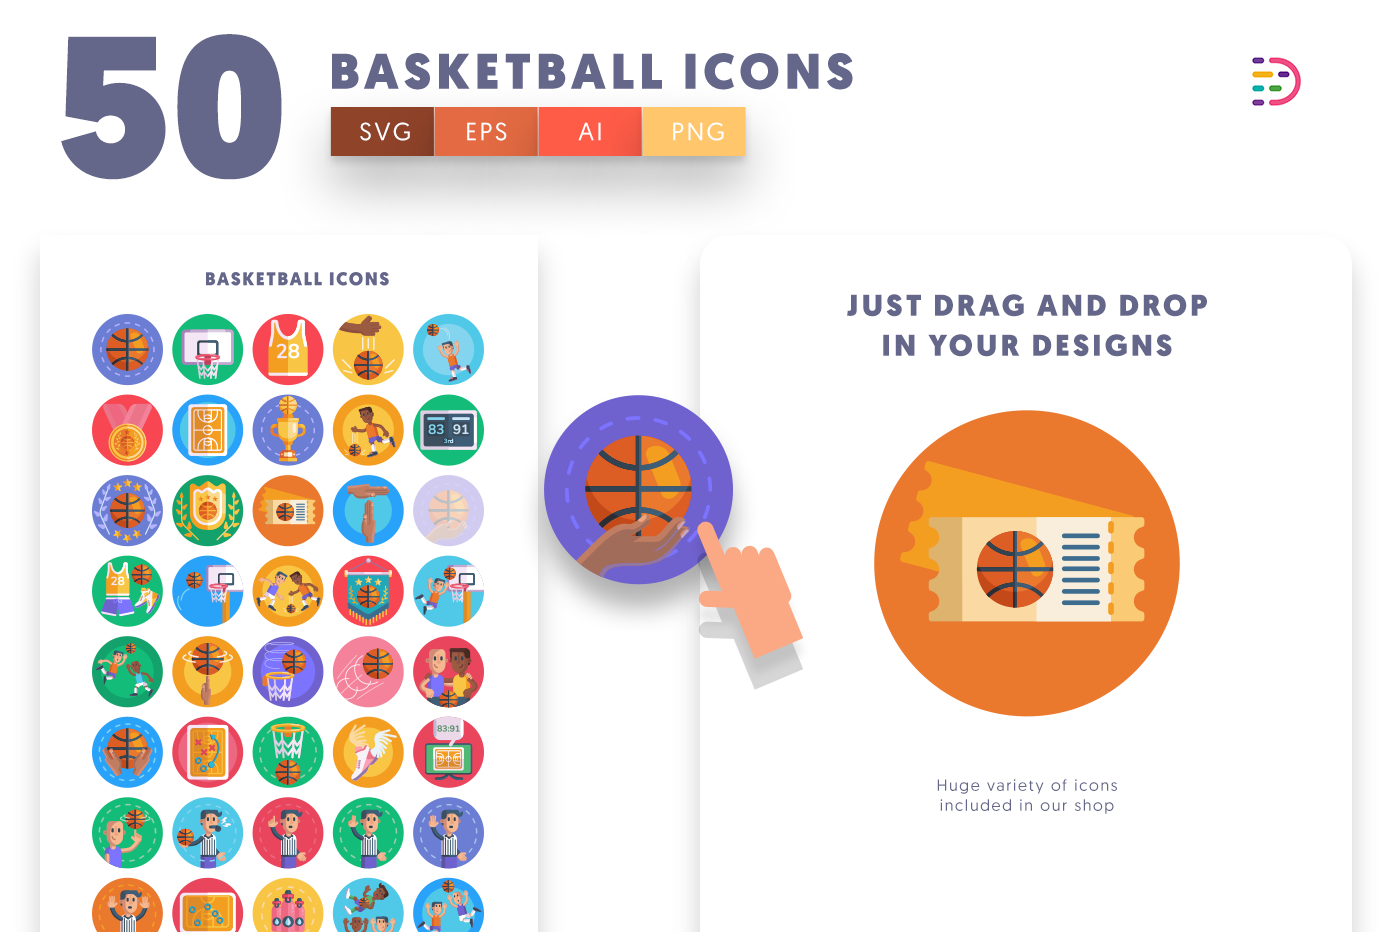 Drag and drop vector 50 Basketball Icons